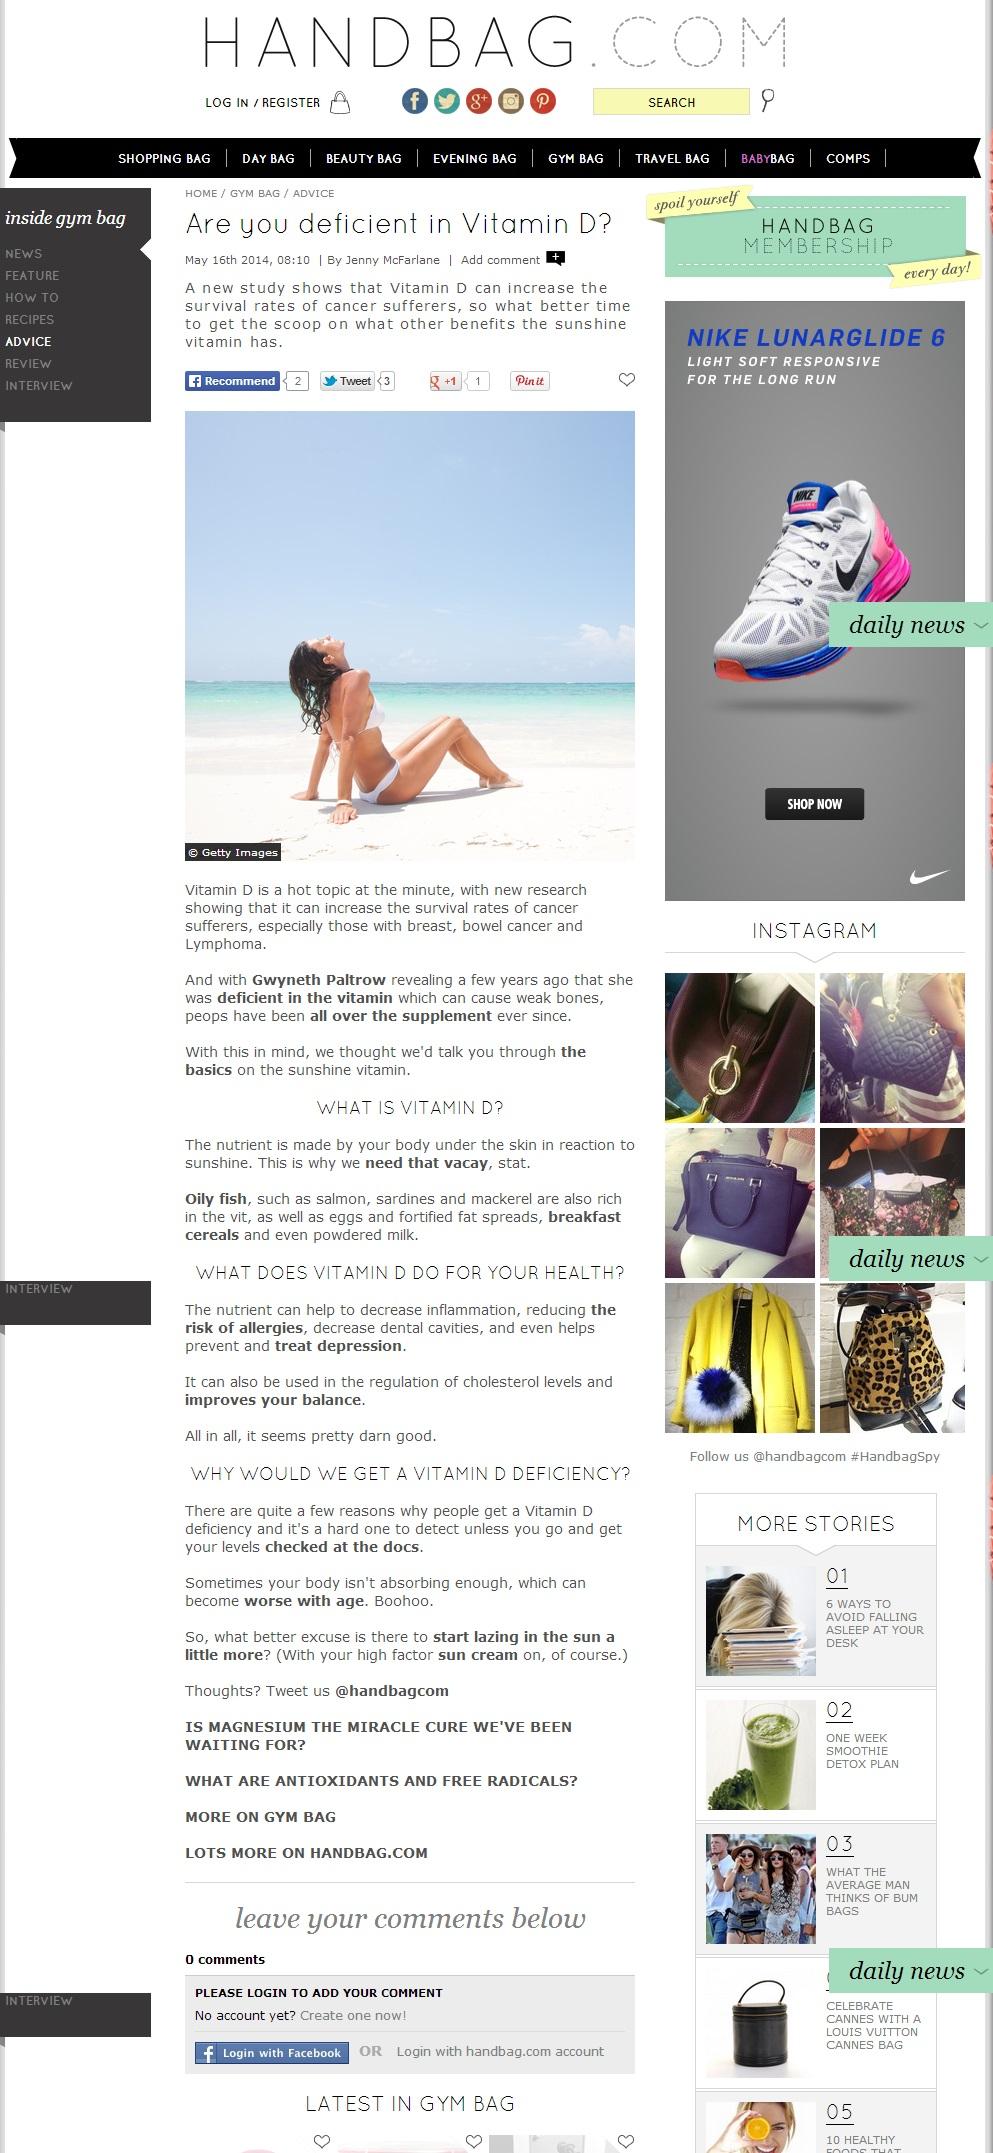 screencapture-www-handbag-com-gym-bag-advice-a570764-are-you-deficient-in-vitamin-d-html